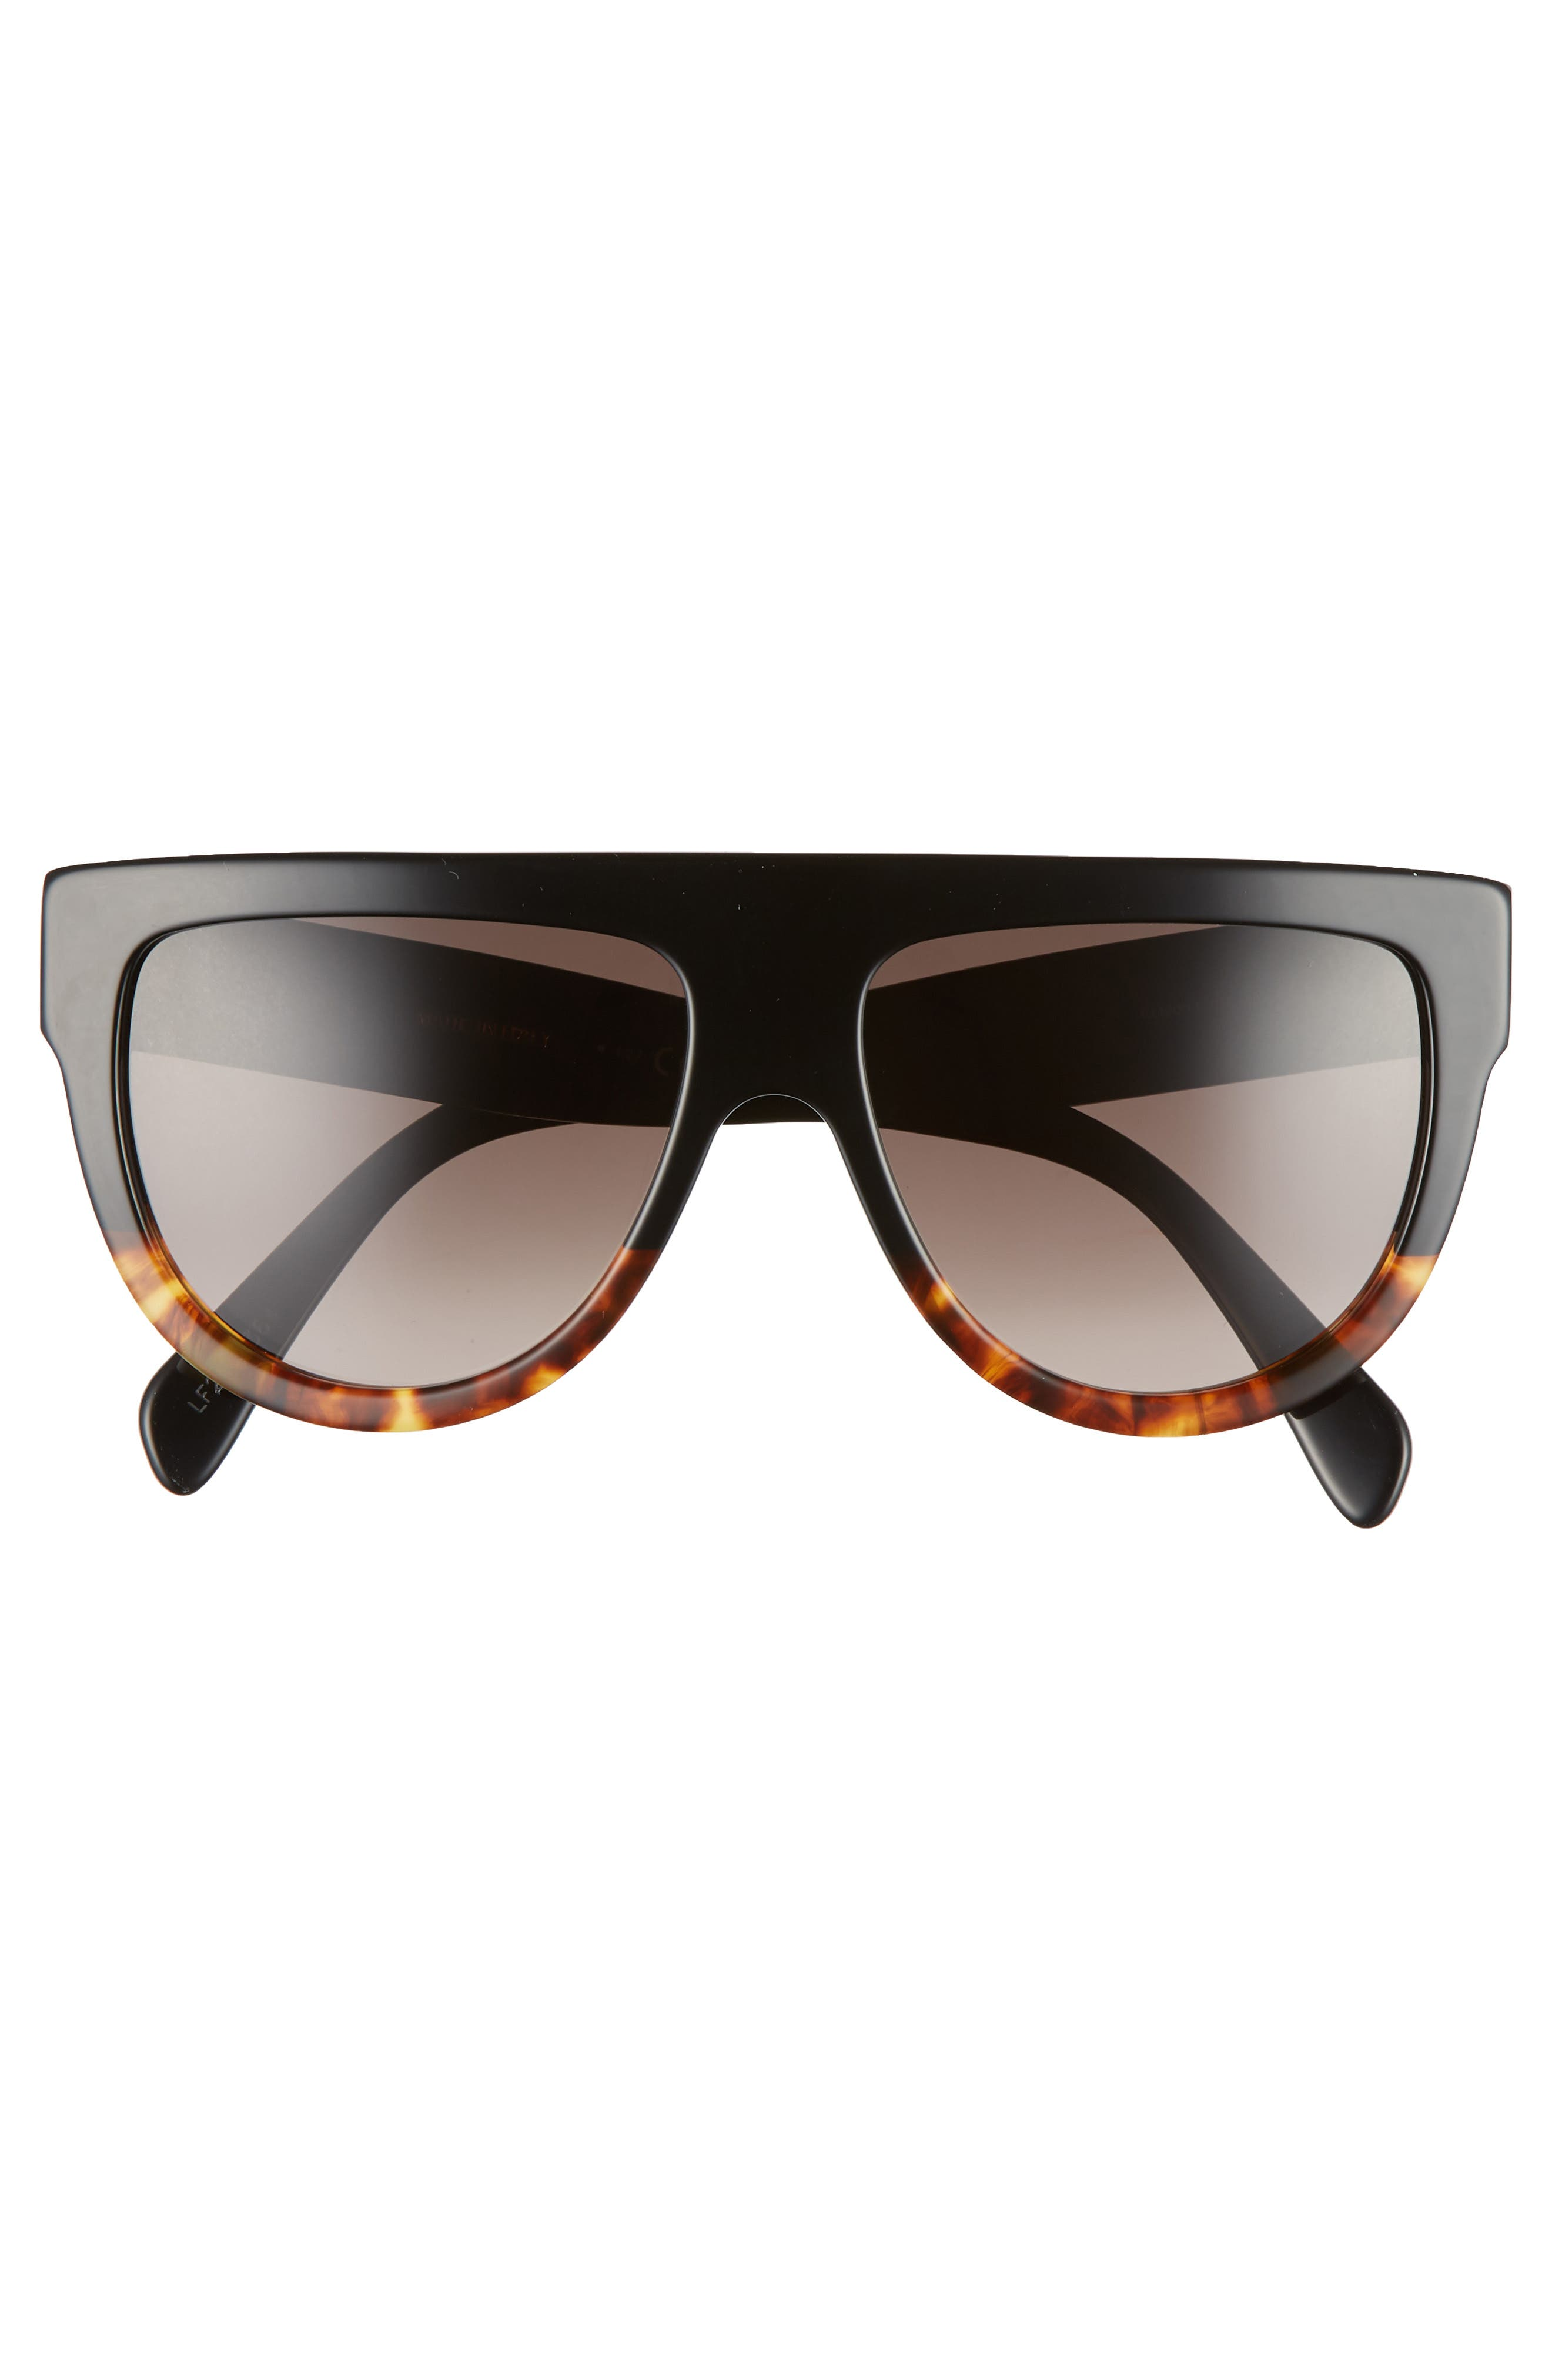 Flat Top Sunglasses,                             Alternate thumbnail 4, color,                             BLACK/ HAVANA/ SMOKE